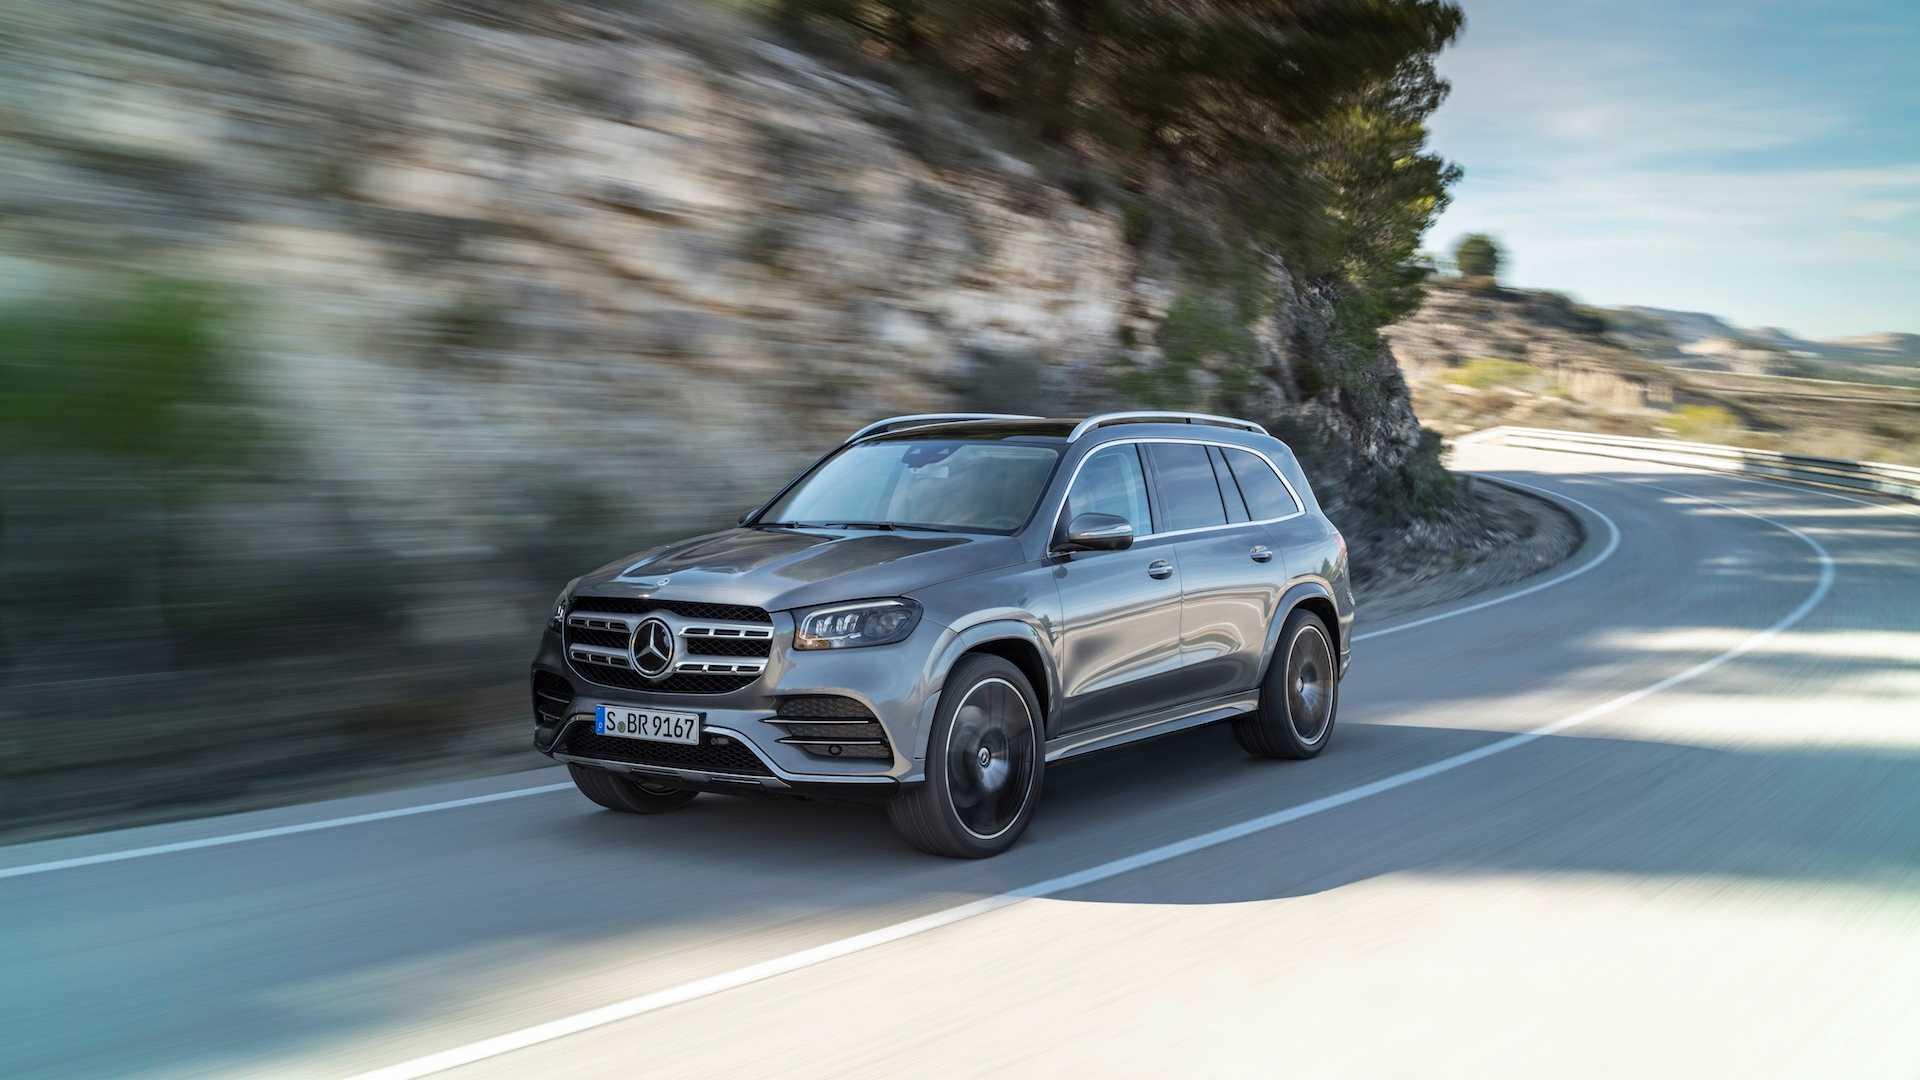 2020 Mercedes-Benz GLS AMG Line (Color: Designo Selenite Grey Metallic) Front Three-Quarter Wallpapers (1)